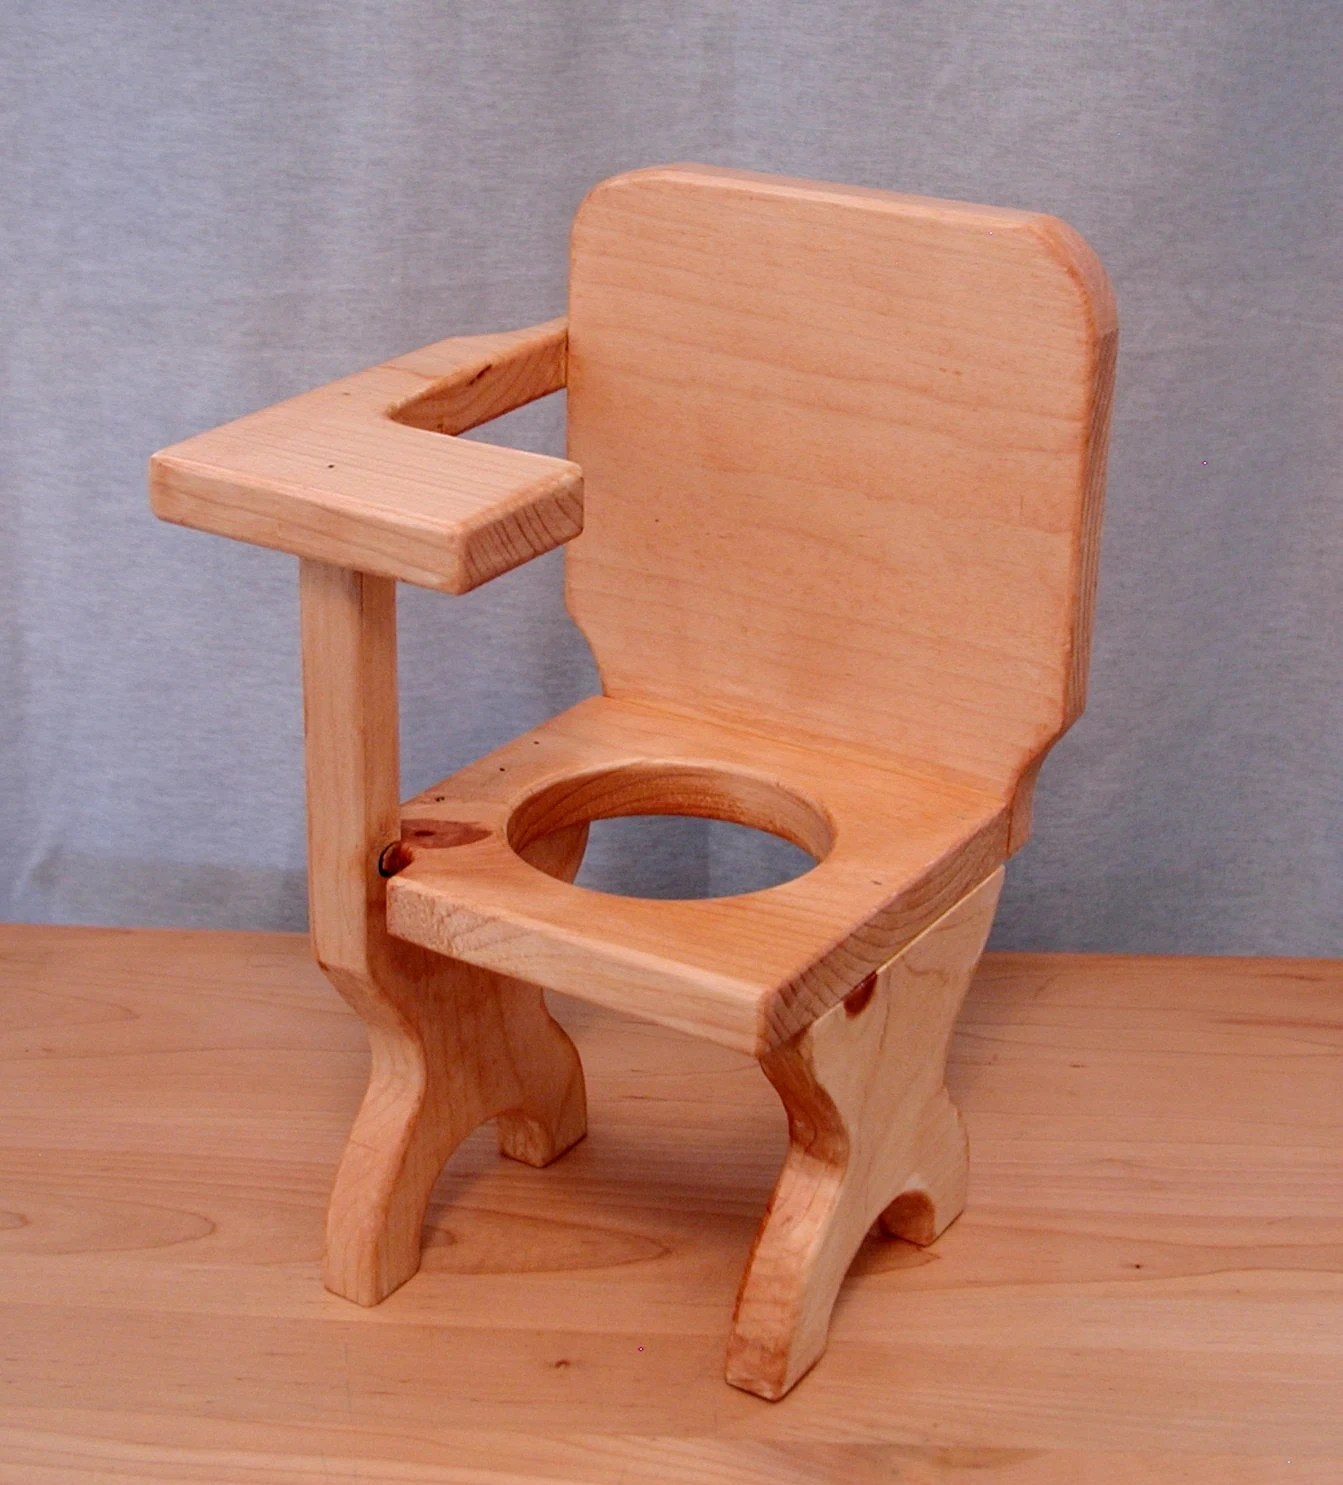 wheelchair with pot best reading chair australia desk flower